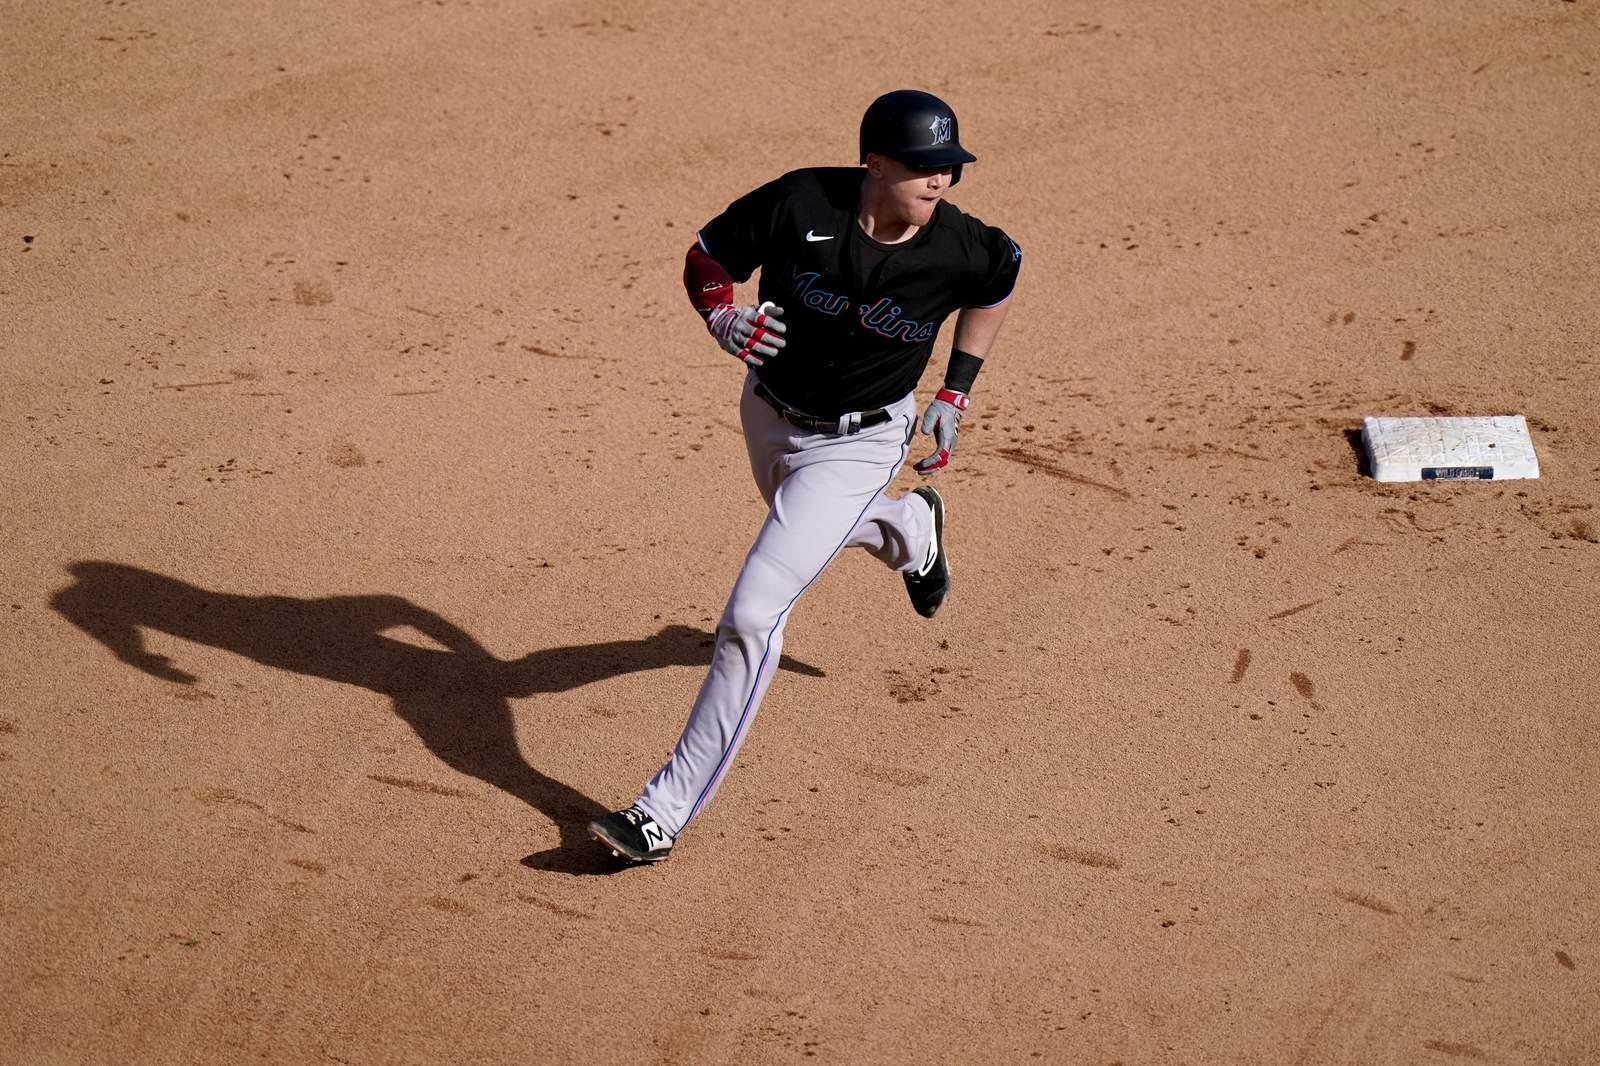 Marlins knock off Cubs, advance to NLDS vs. Braves